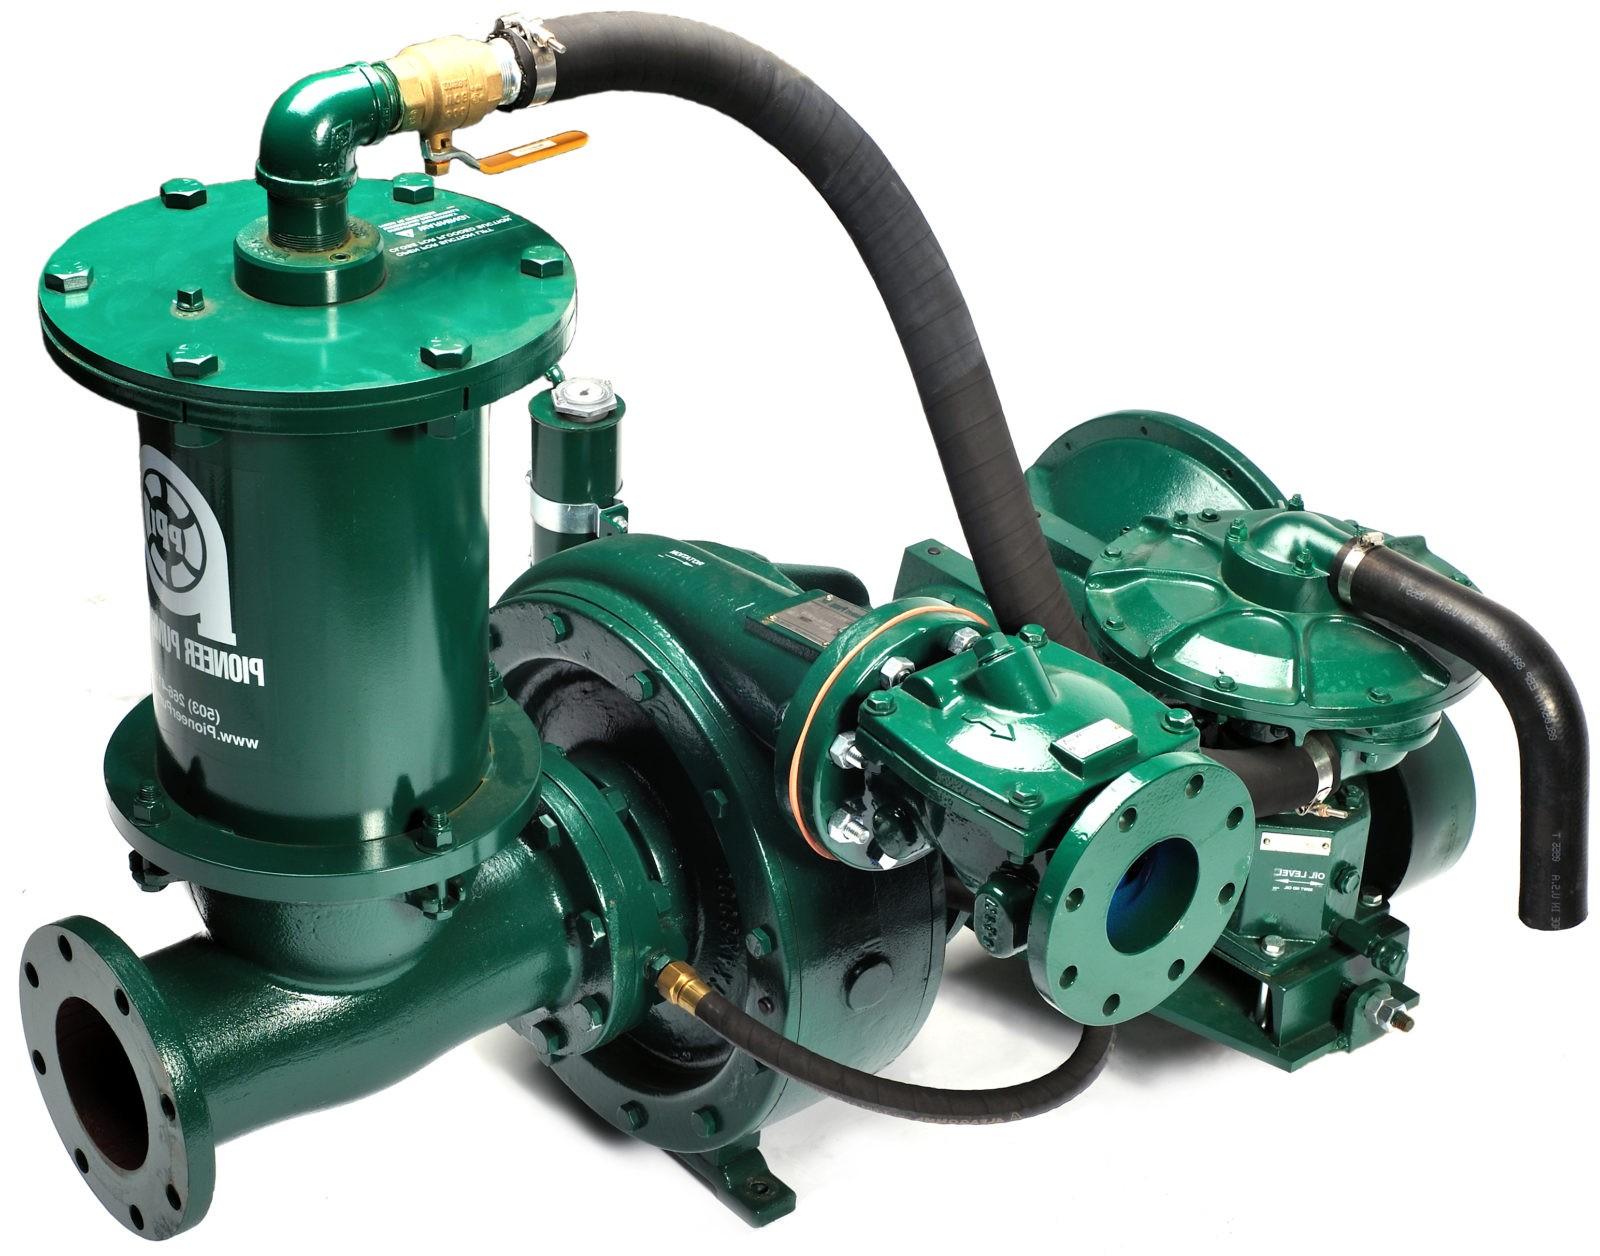 dry prime pump, vakum destekli pompa, kendinden emişli pompa